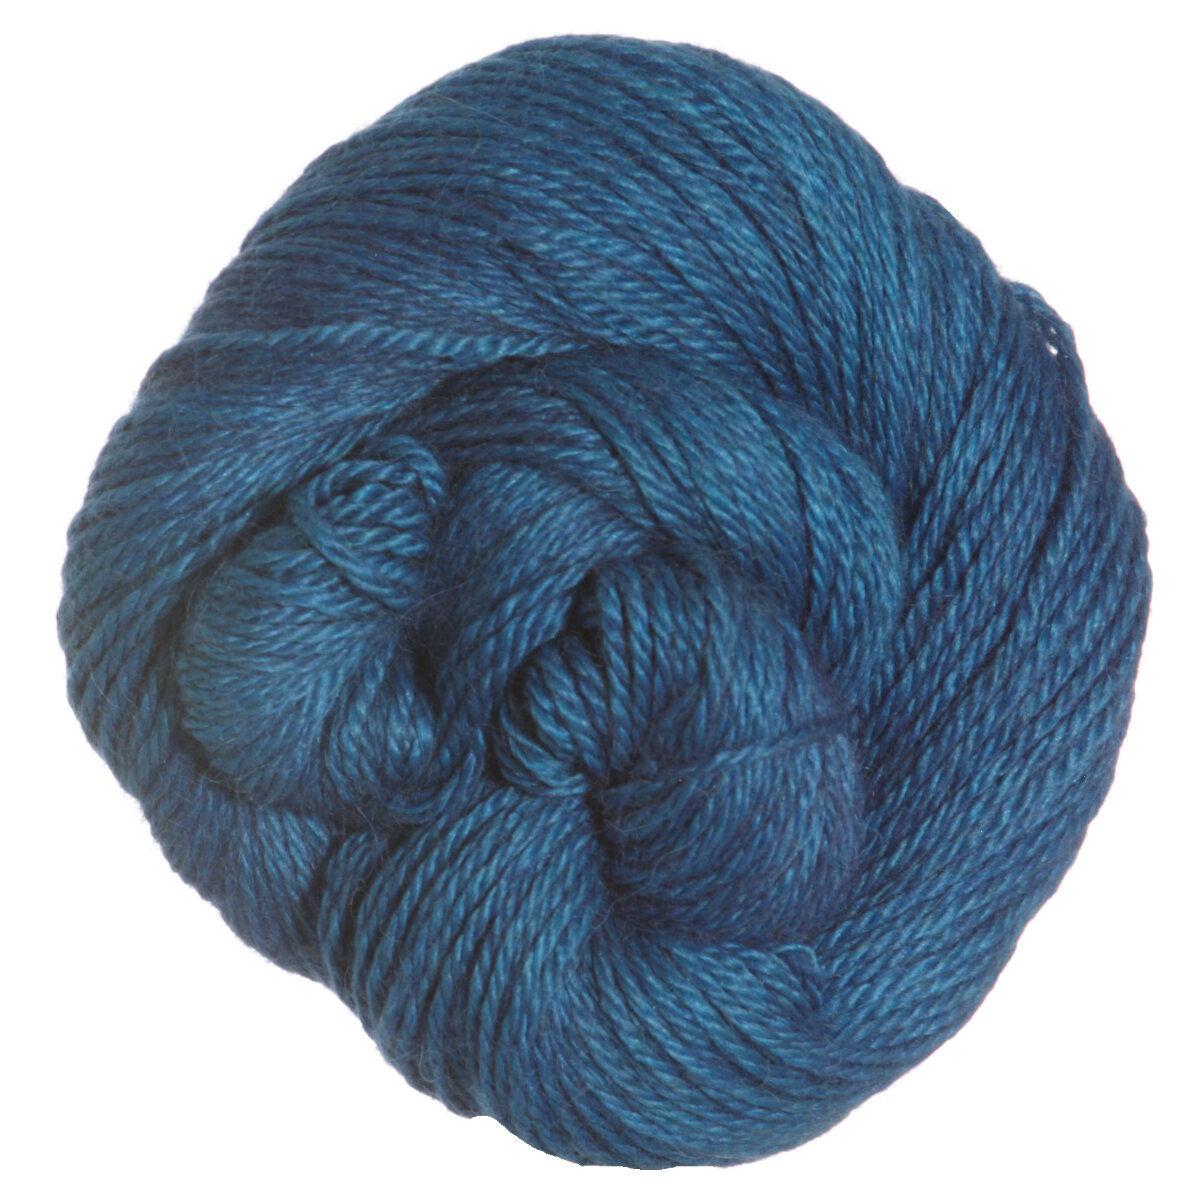 The Fibre Company Road To China Light Yarn Sapphire At